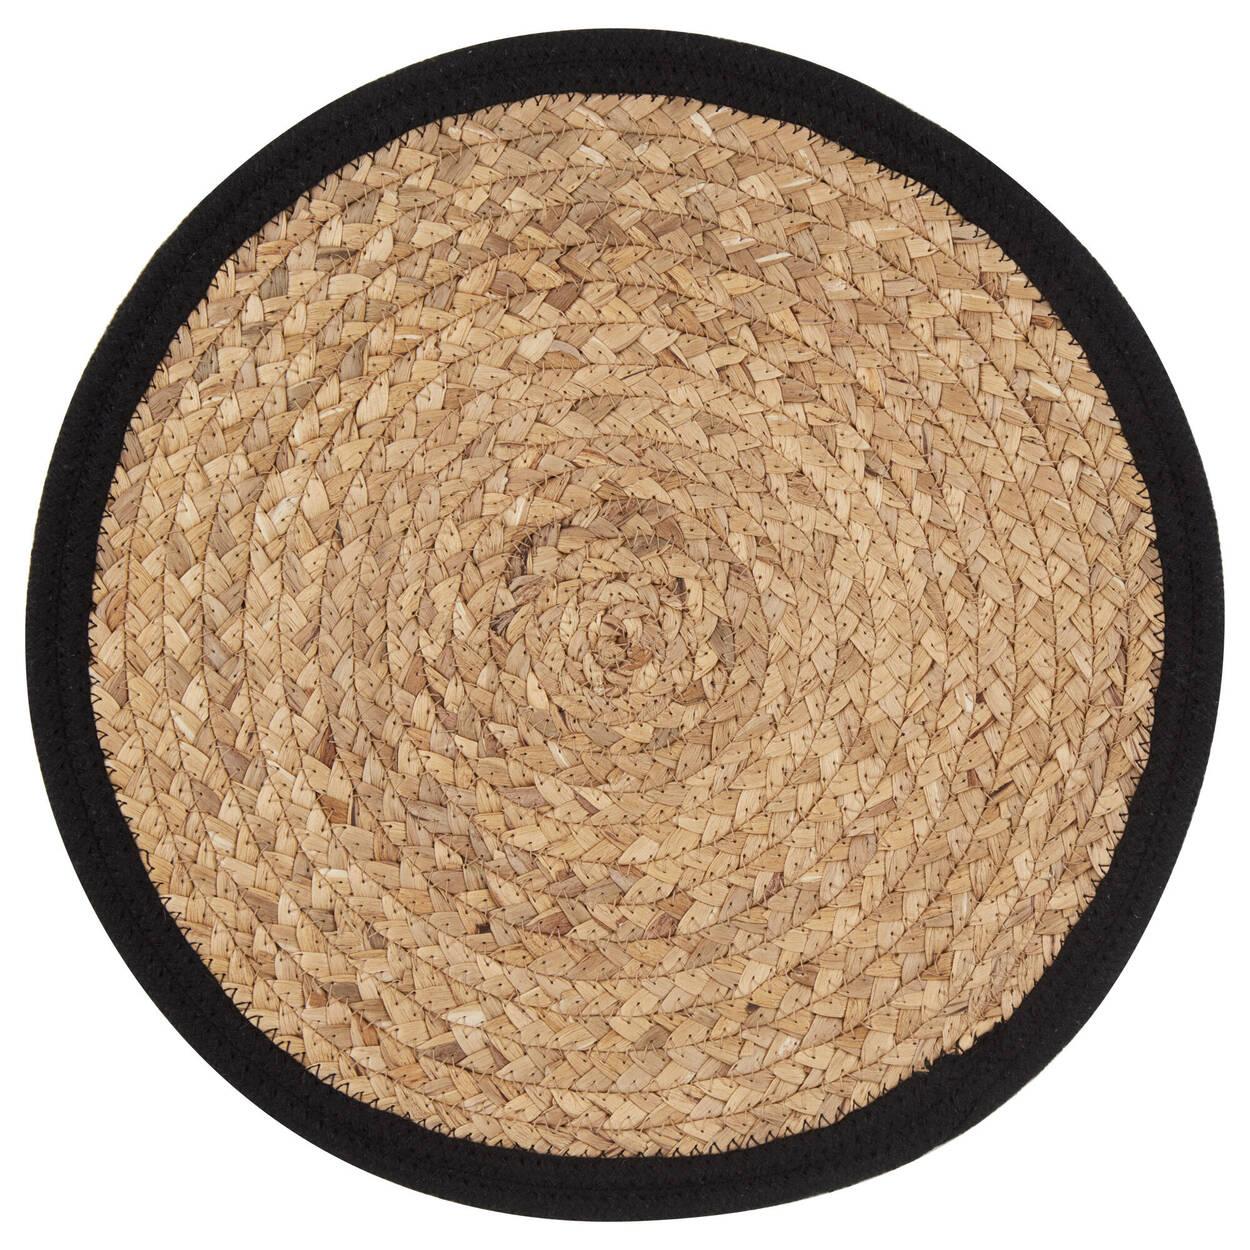 Napperon en fibre naturelle rond